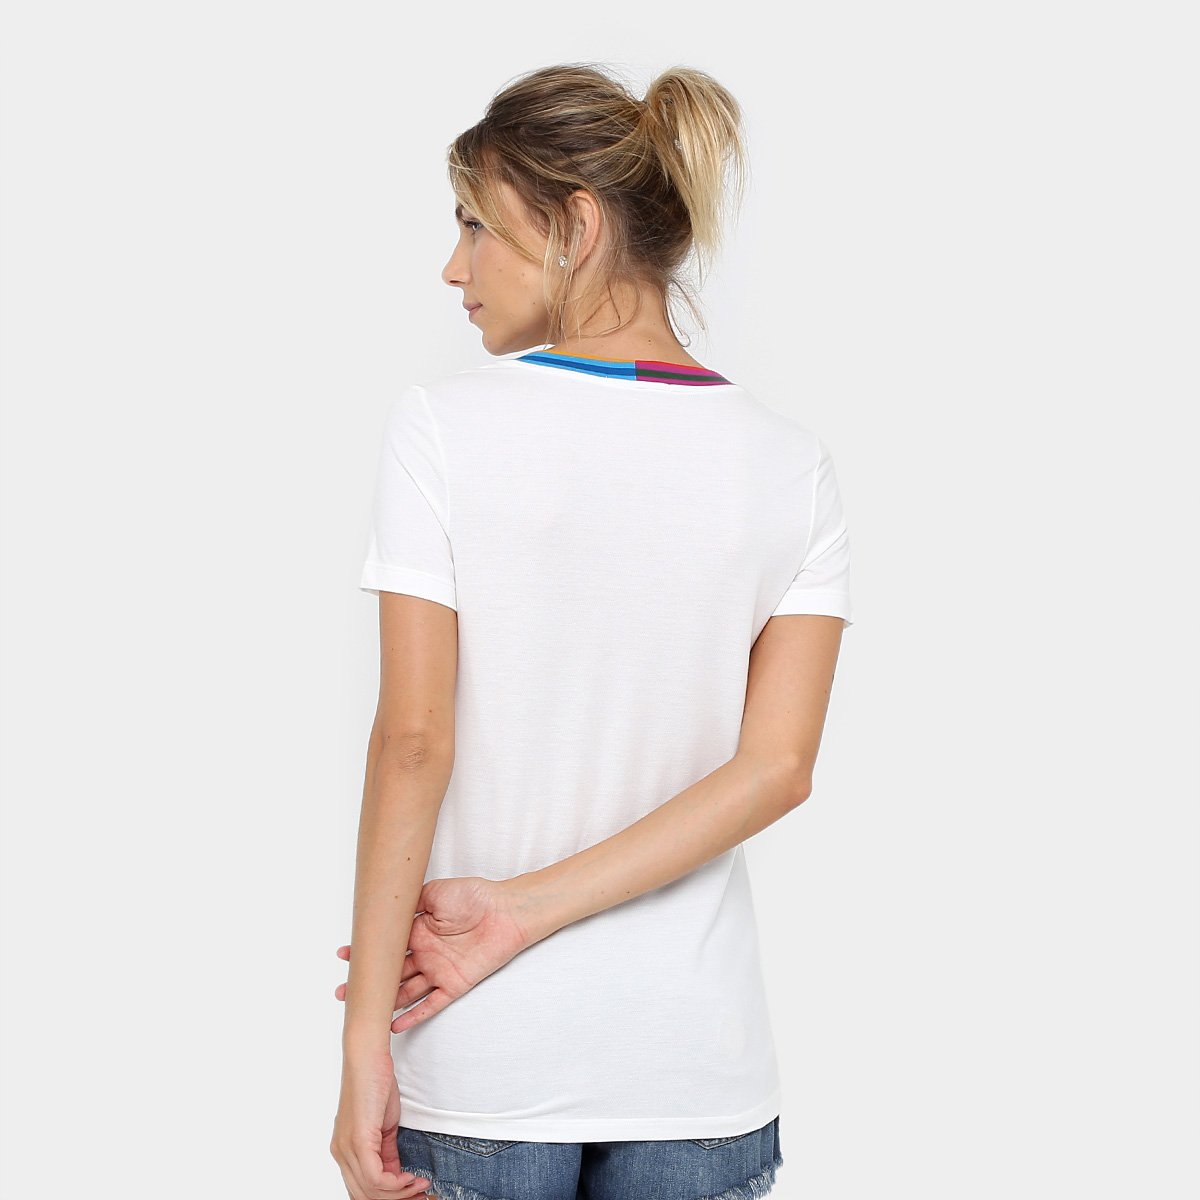 Casmiseta Lacoste Decote V Colorido Feminina - Compre Agora   Netshoes 3649bf4d0a